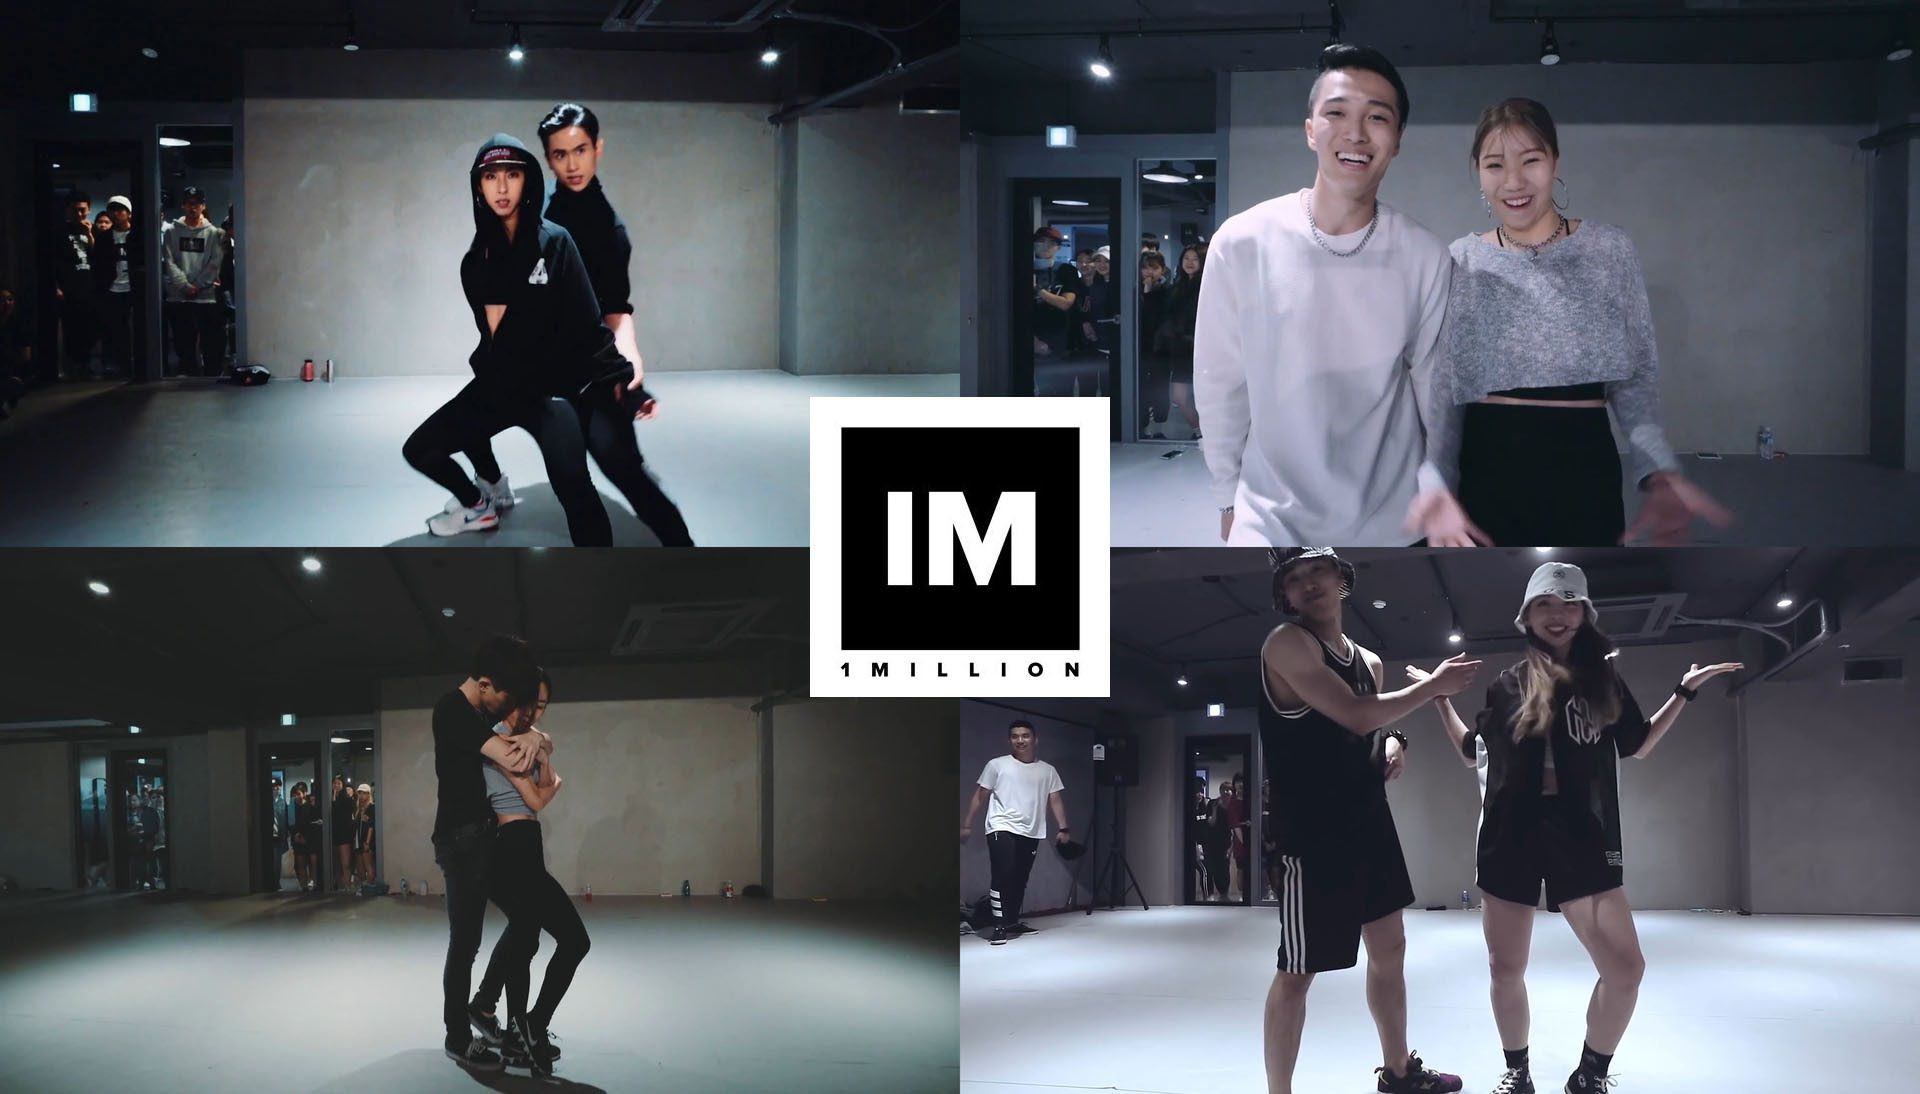 1MILLION | Couple Dance | Valentine's Day Dance Studio, Valentines Day,  Valentine's Day Diy